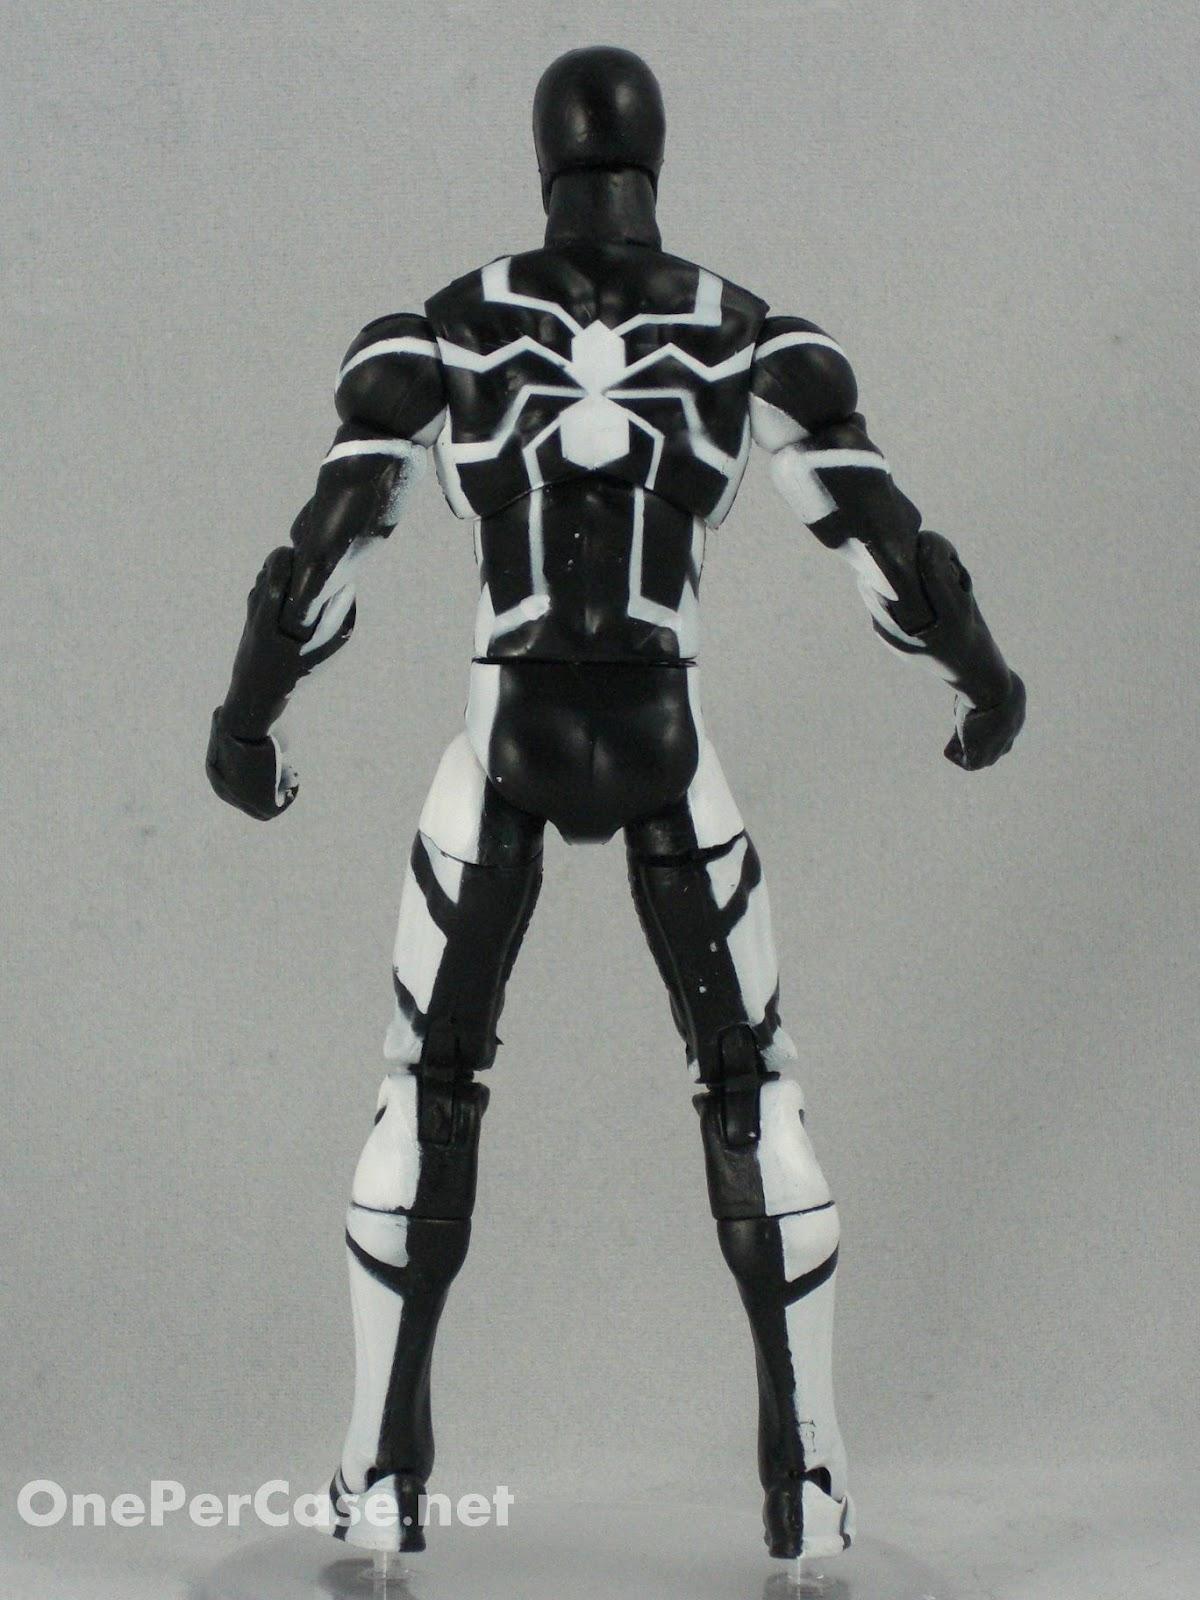 One Per Case Marvel Universe - Black Costume Spider-Man u0026 Dr. Doom (TRU Exclusive) & One Per Case: Marvel Universe - Black Costume Spider-Man u0026 Dr. Doom ...